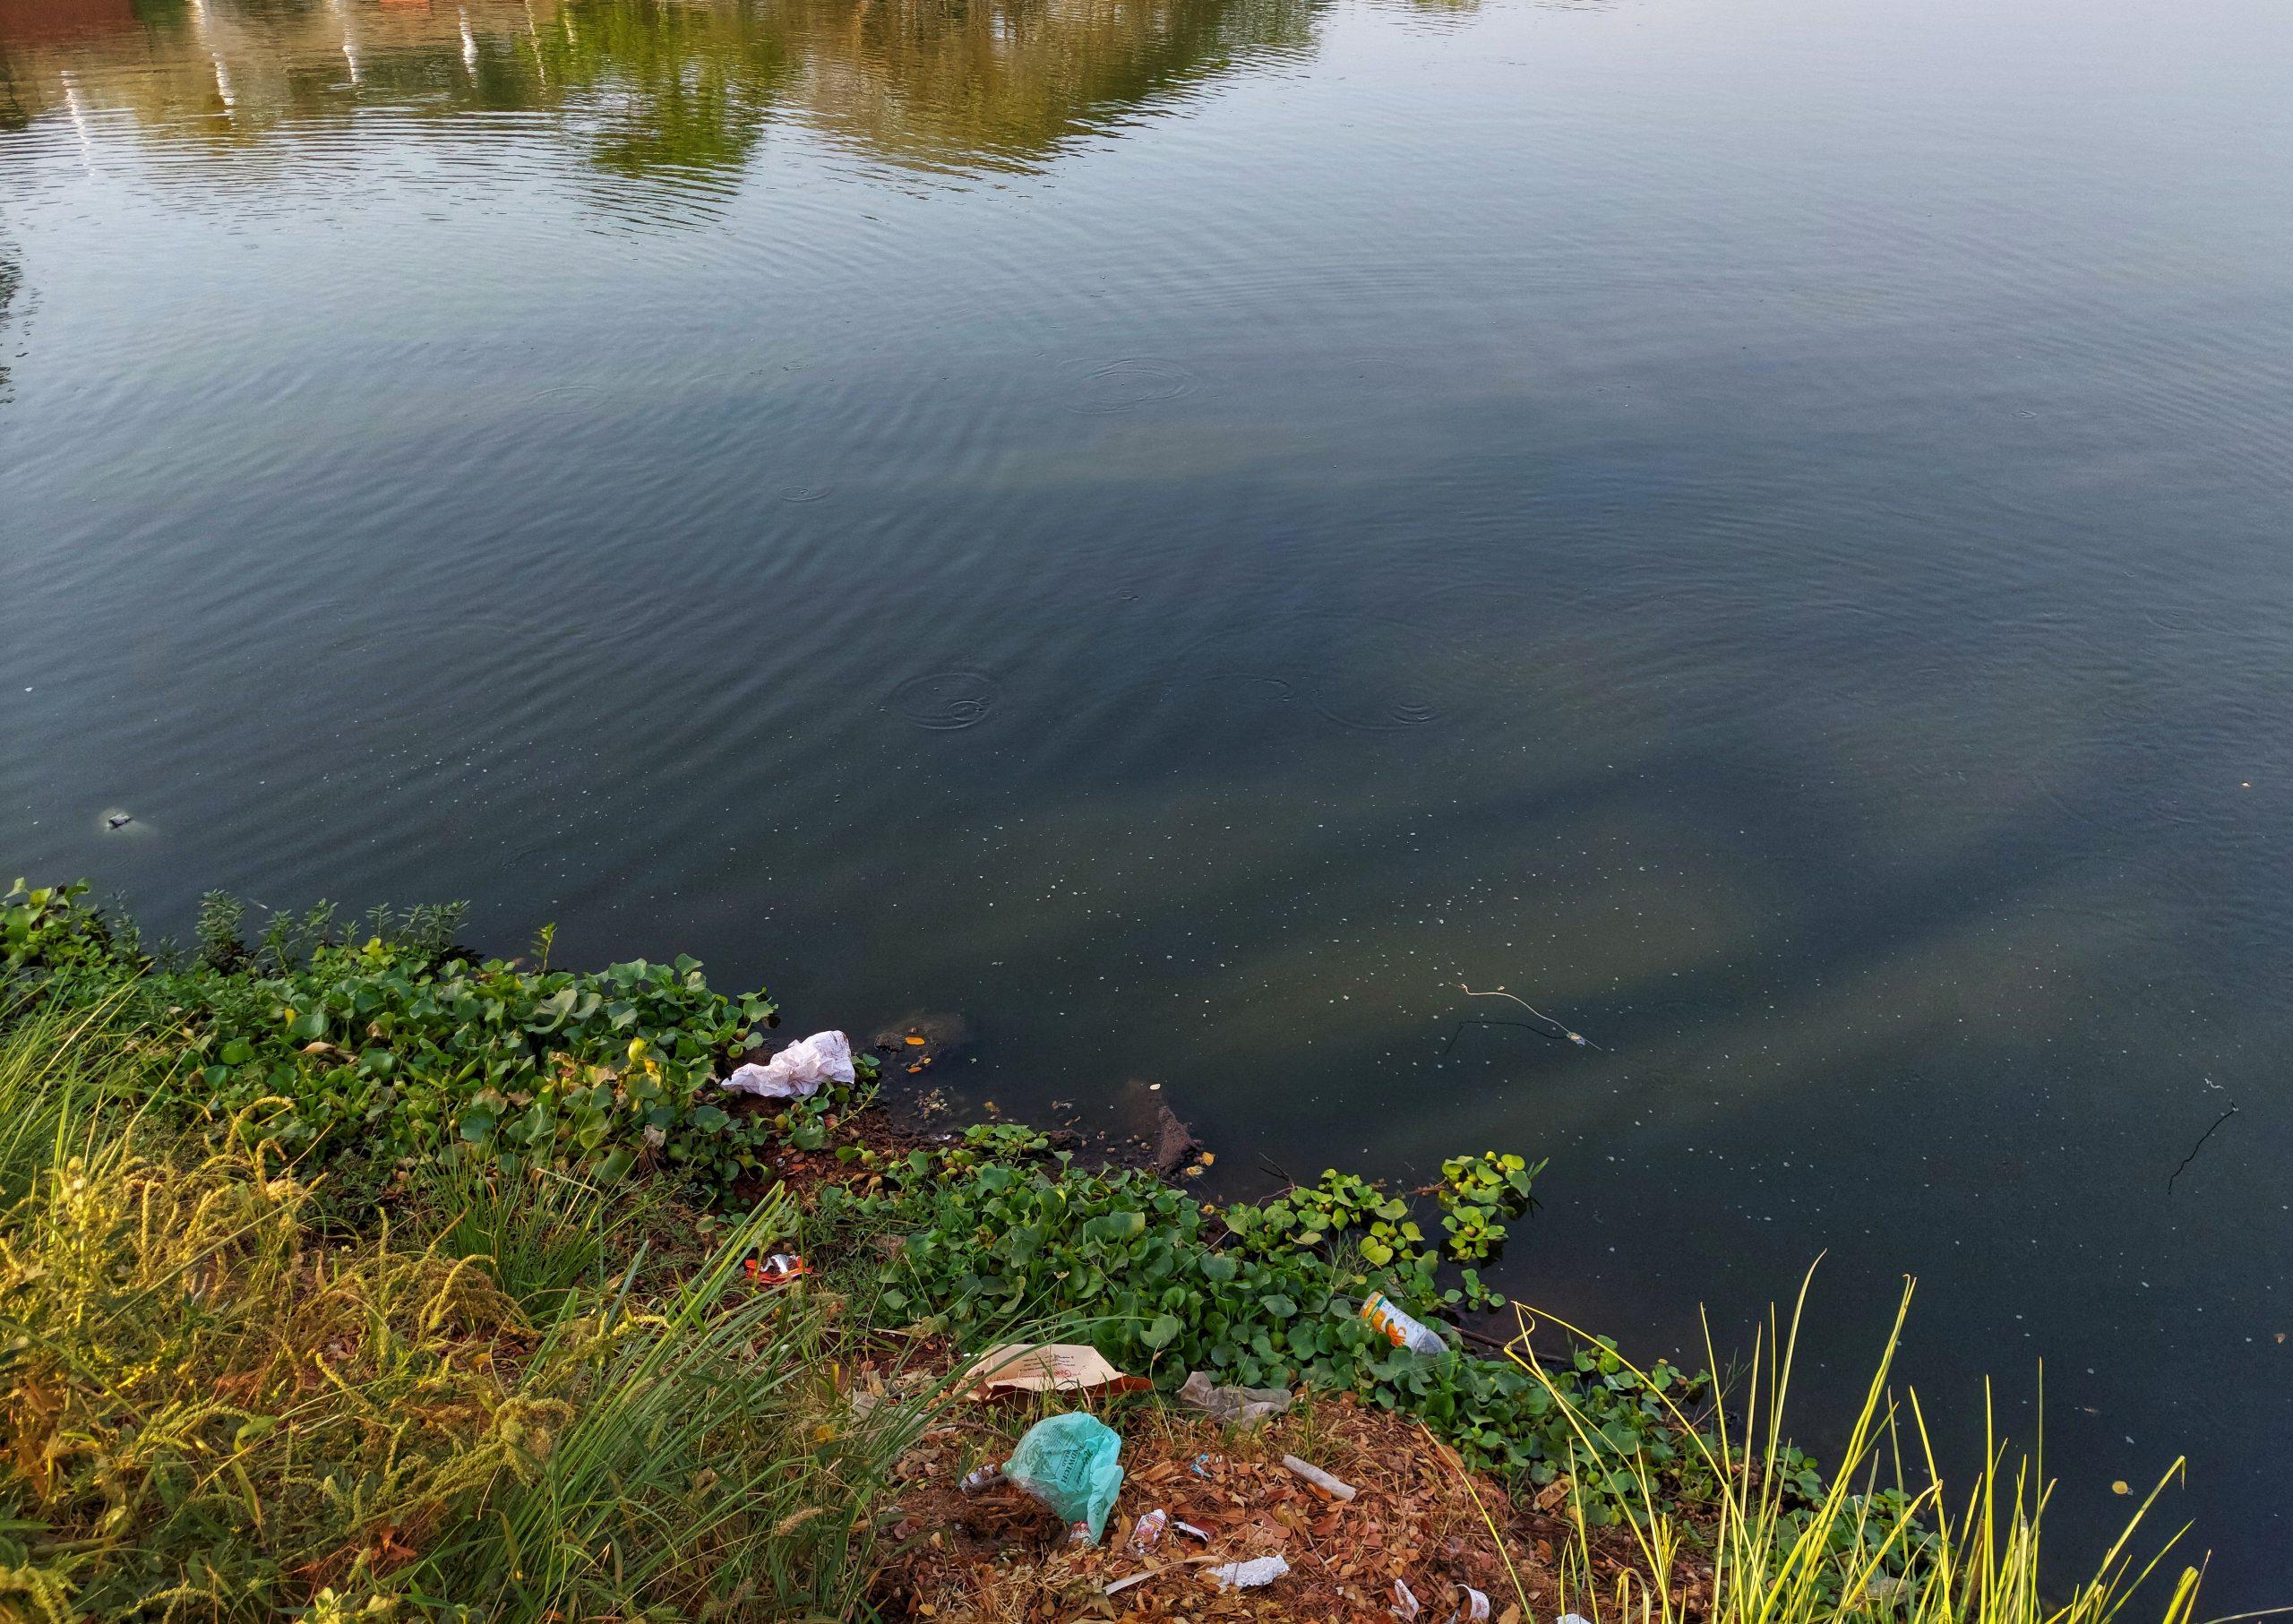 Garbage dumped at a lake shore